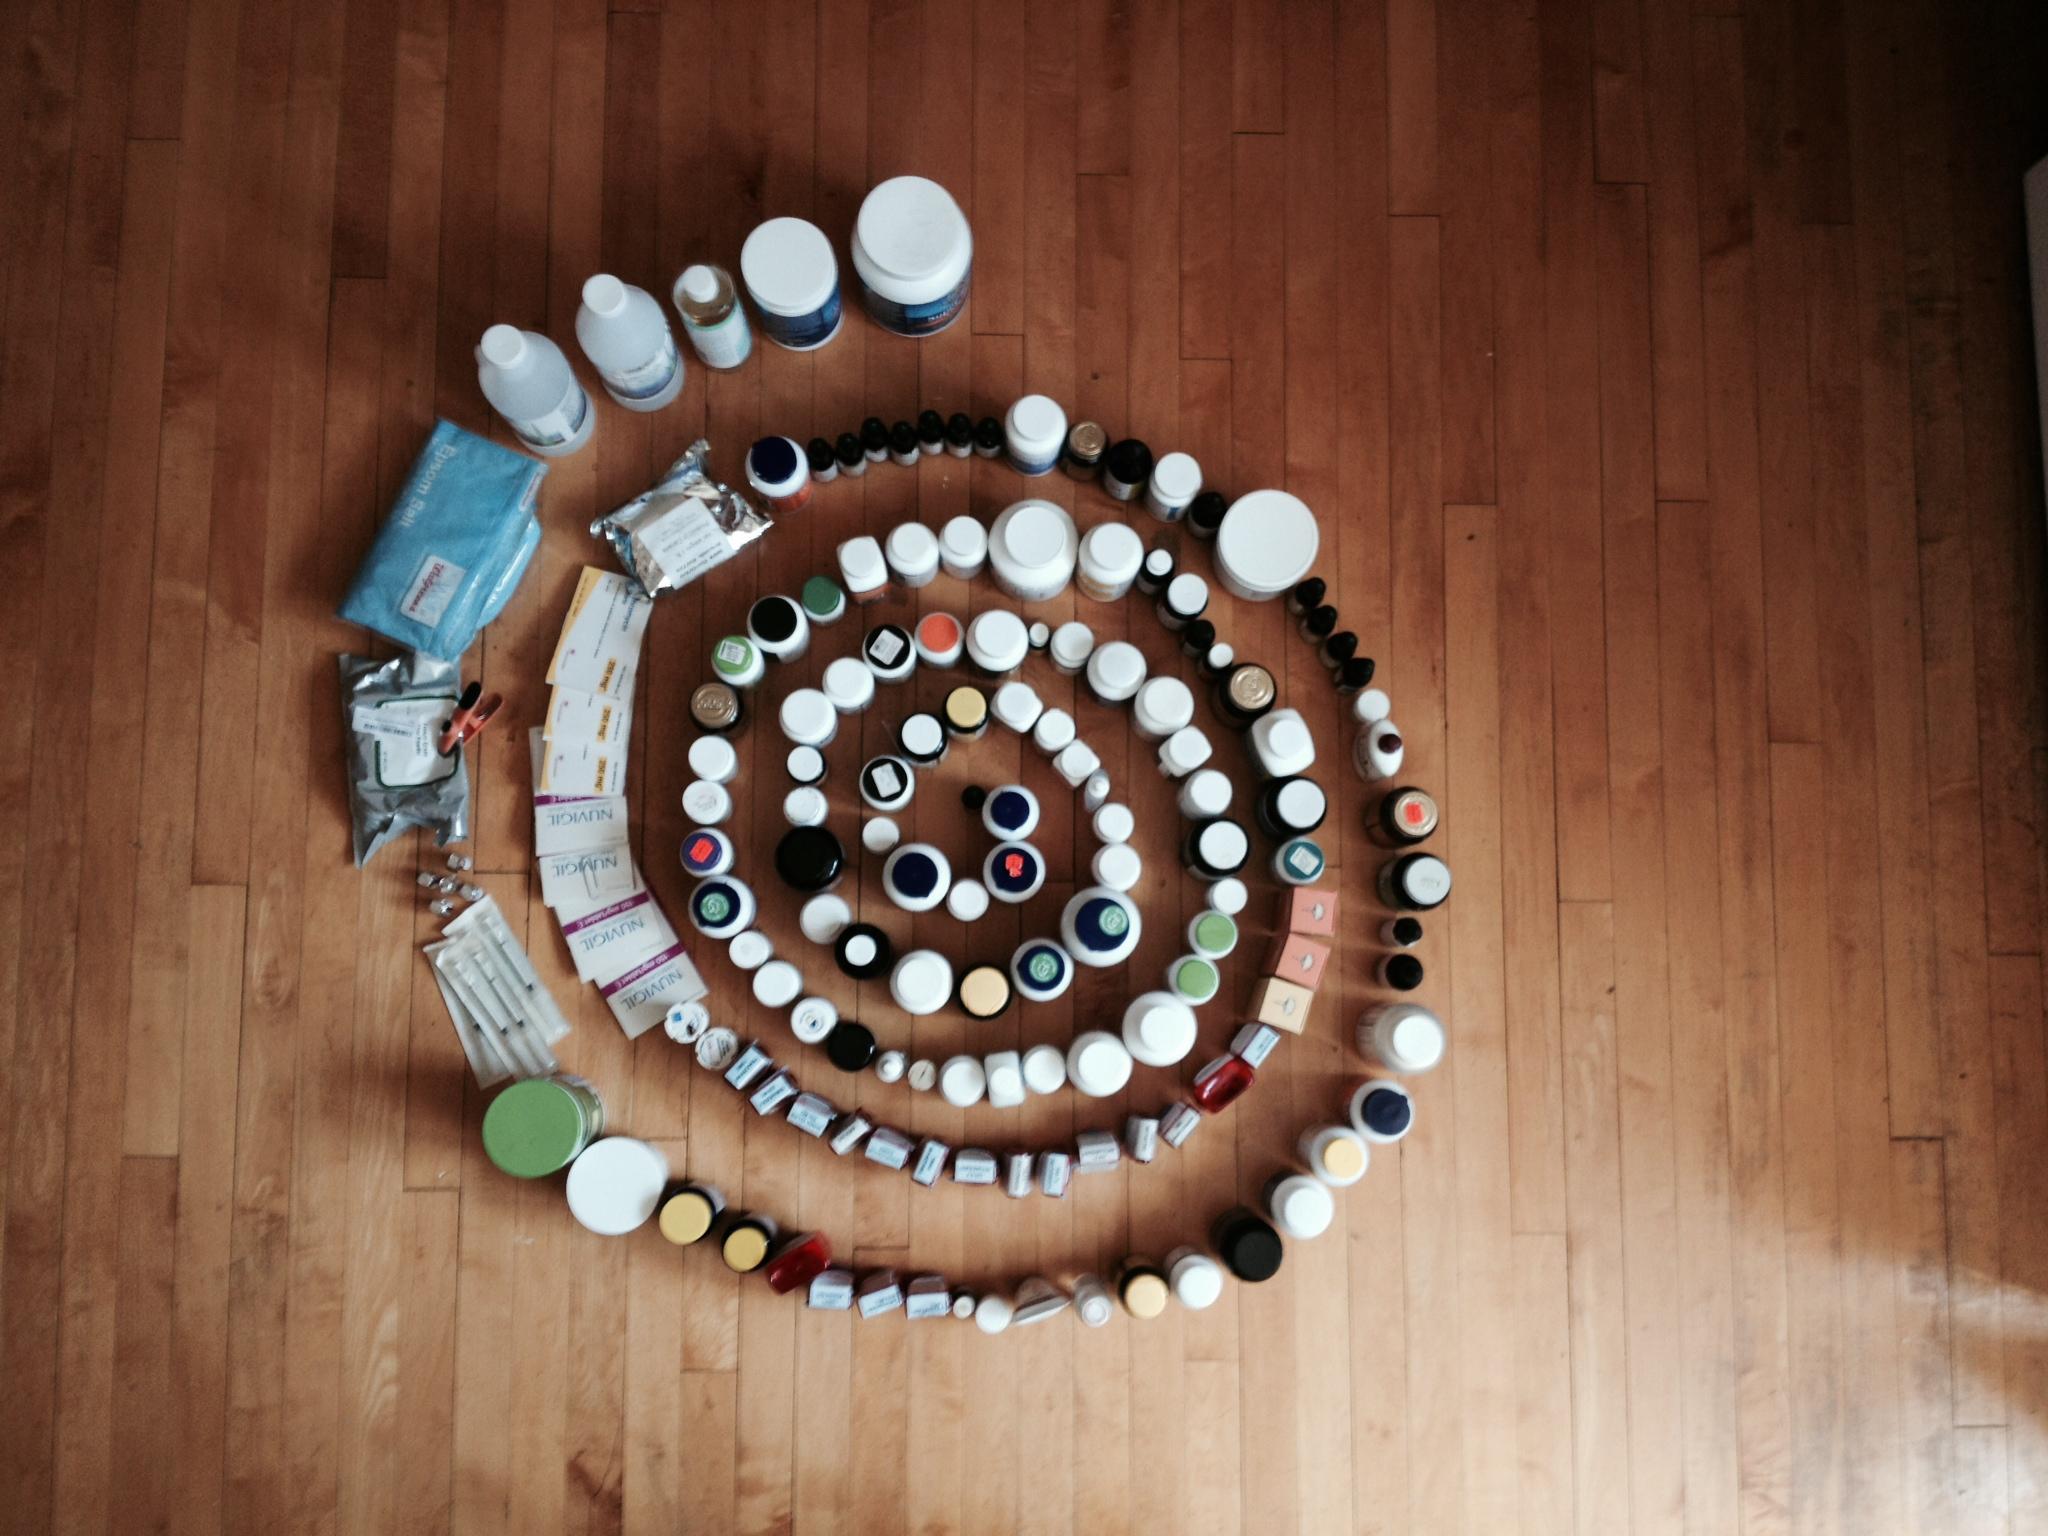 The Dizzying Spiral